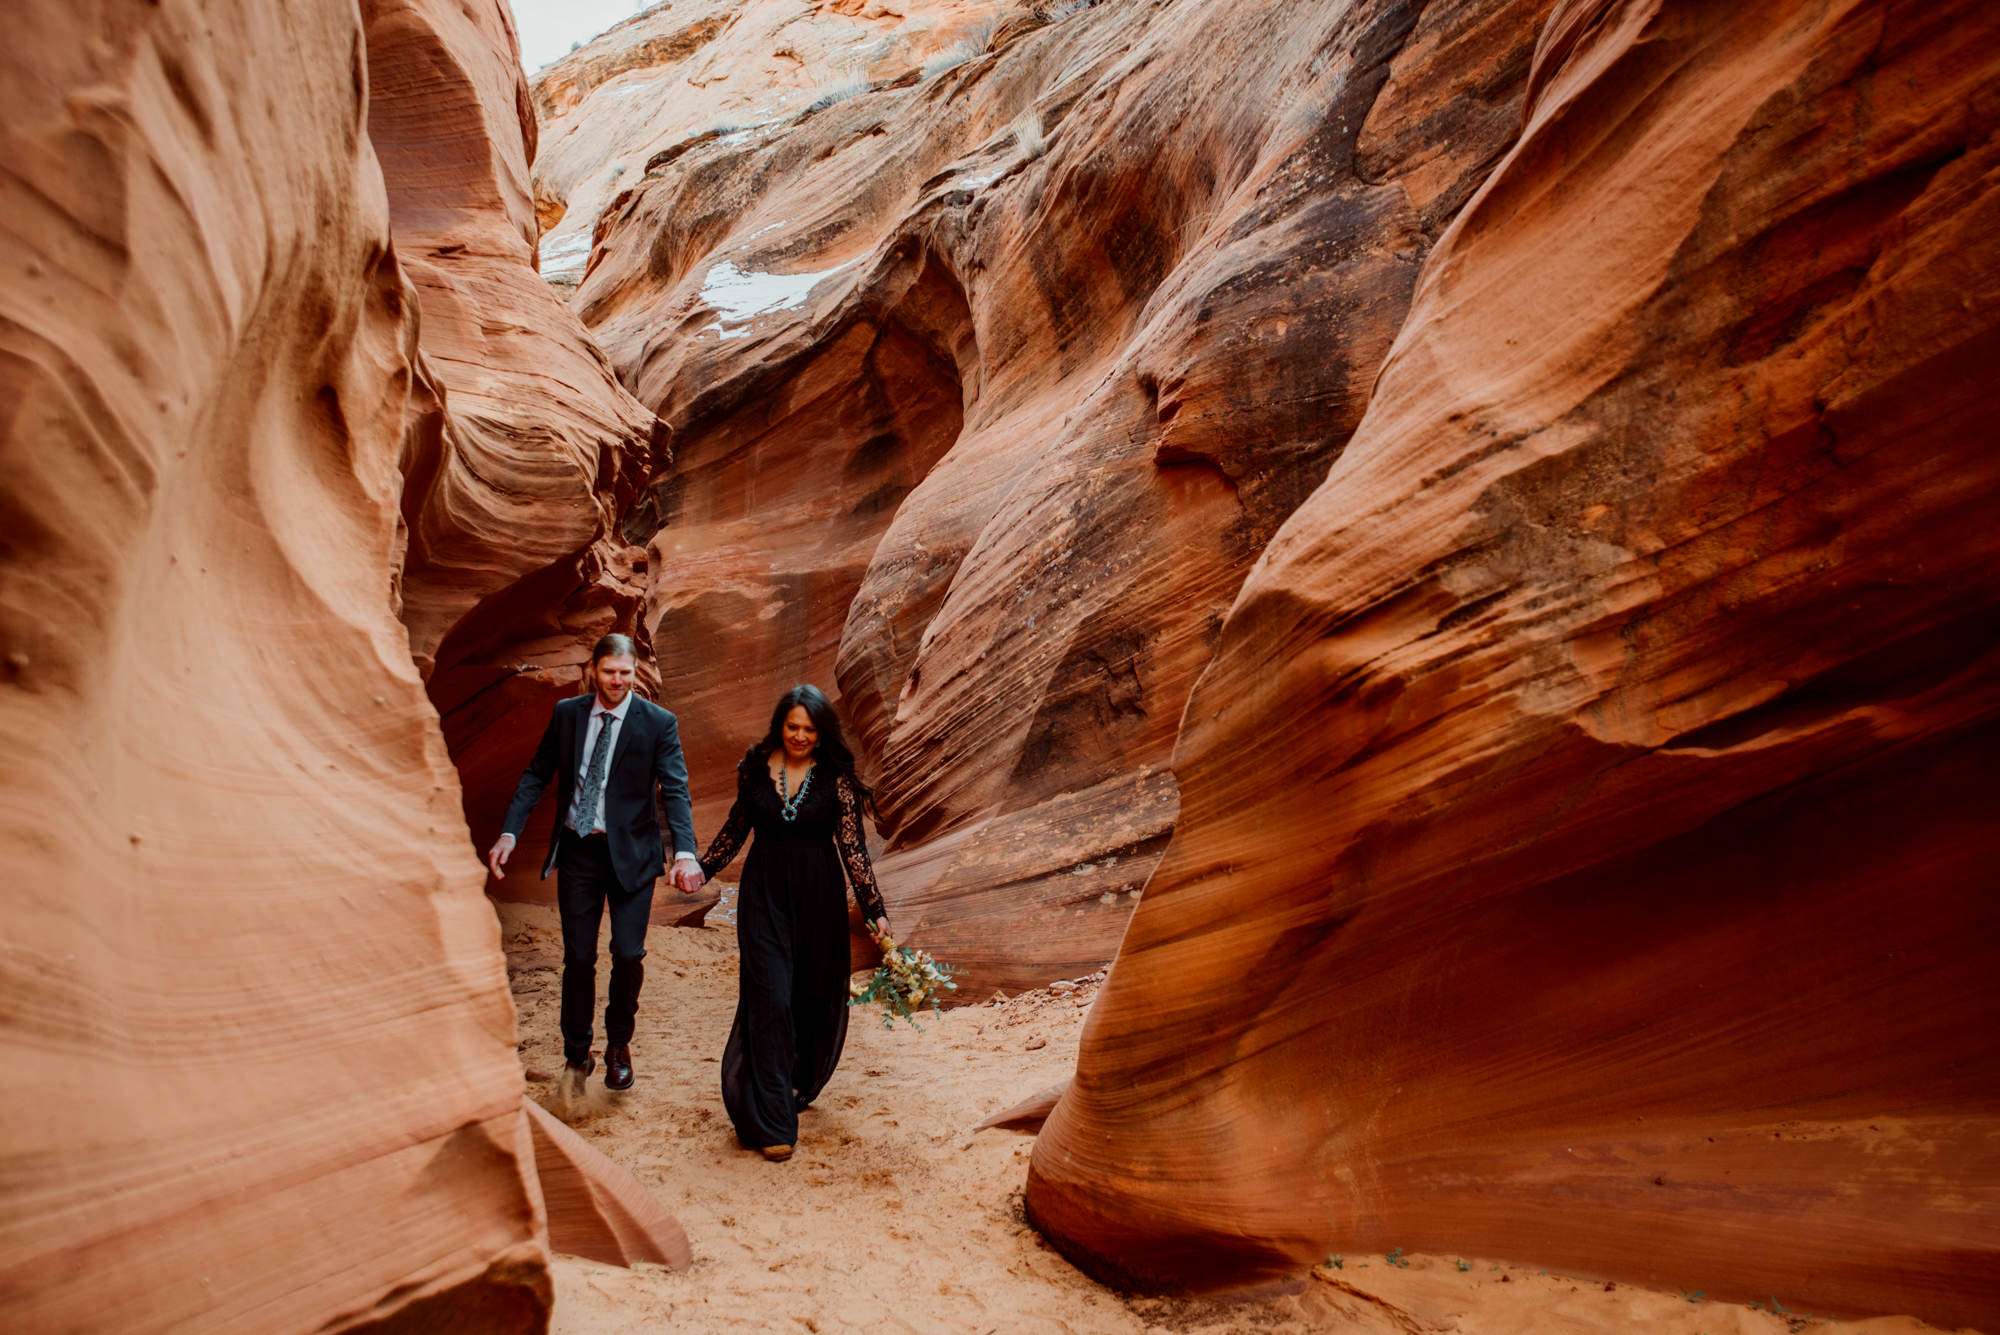 arizona wedding outdoors desert-20.jpg